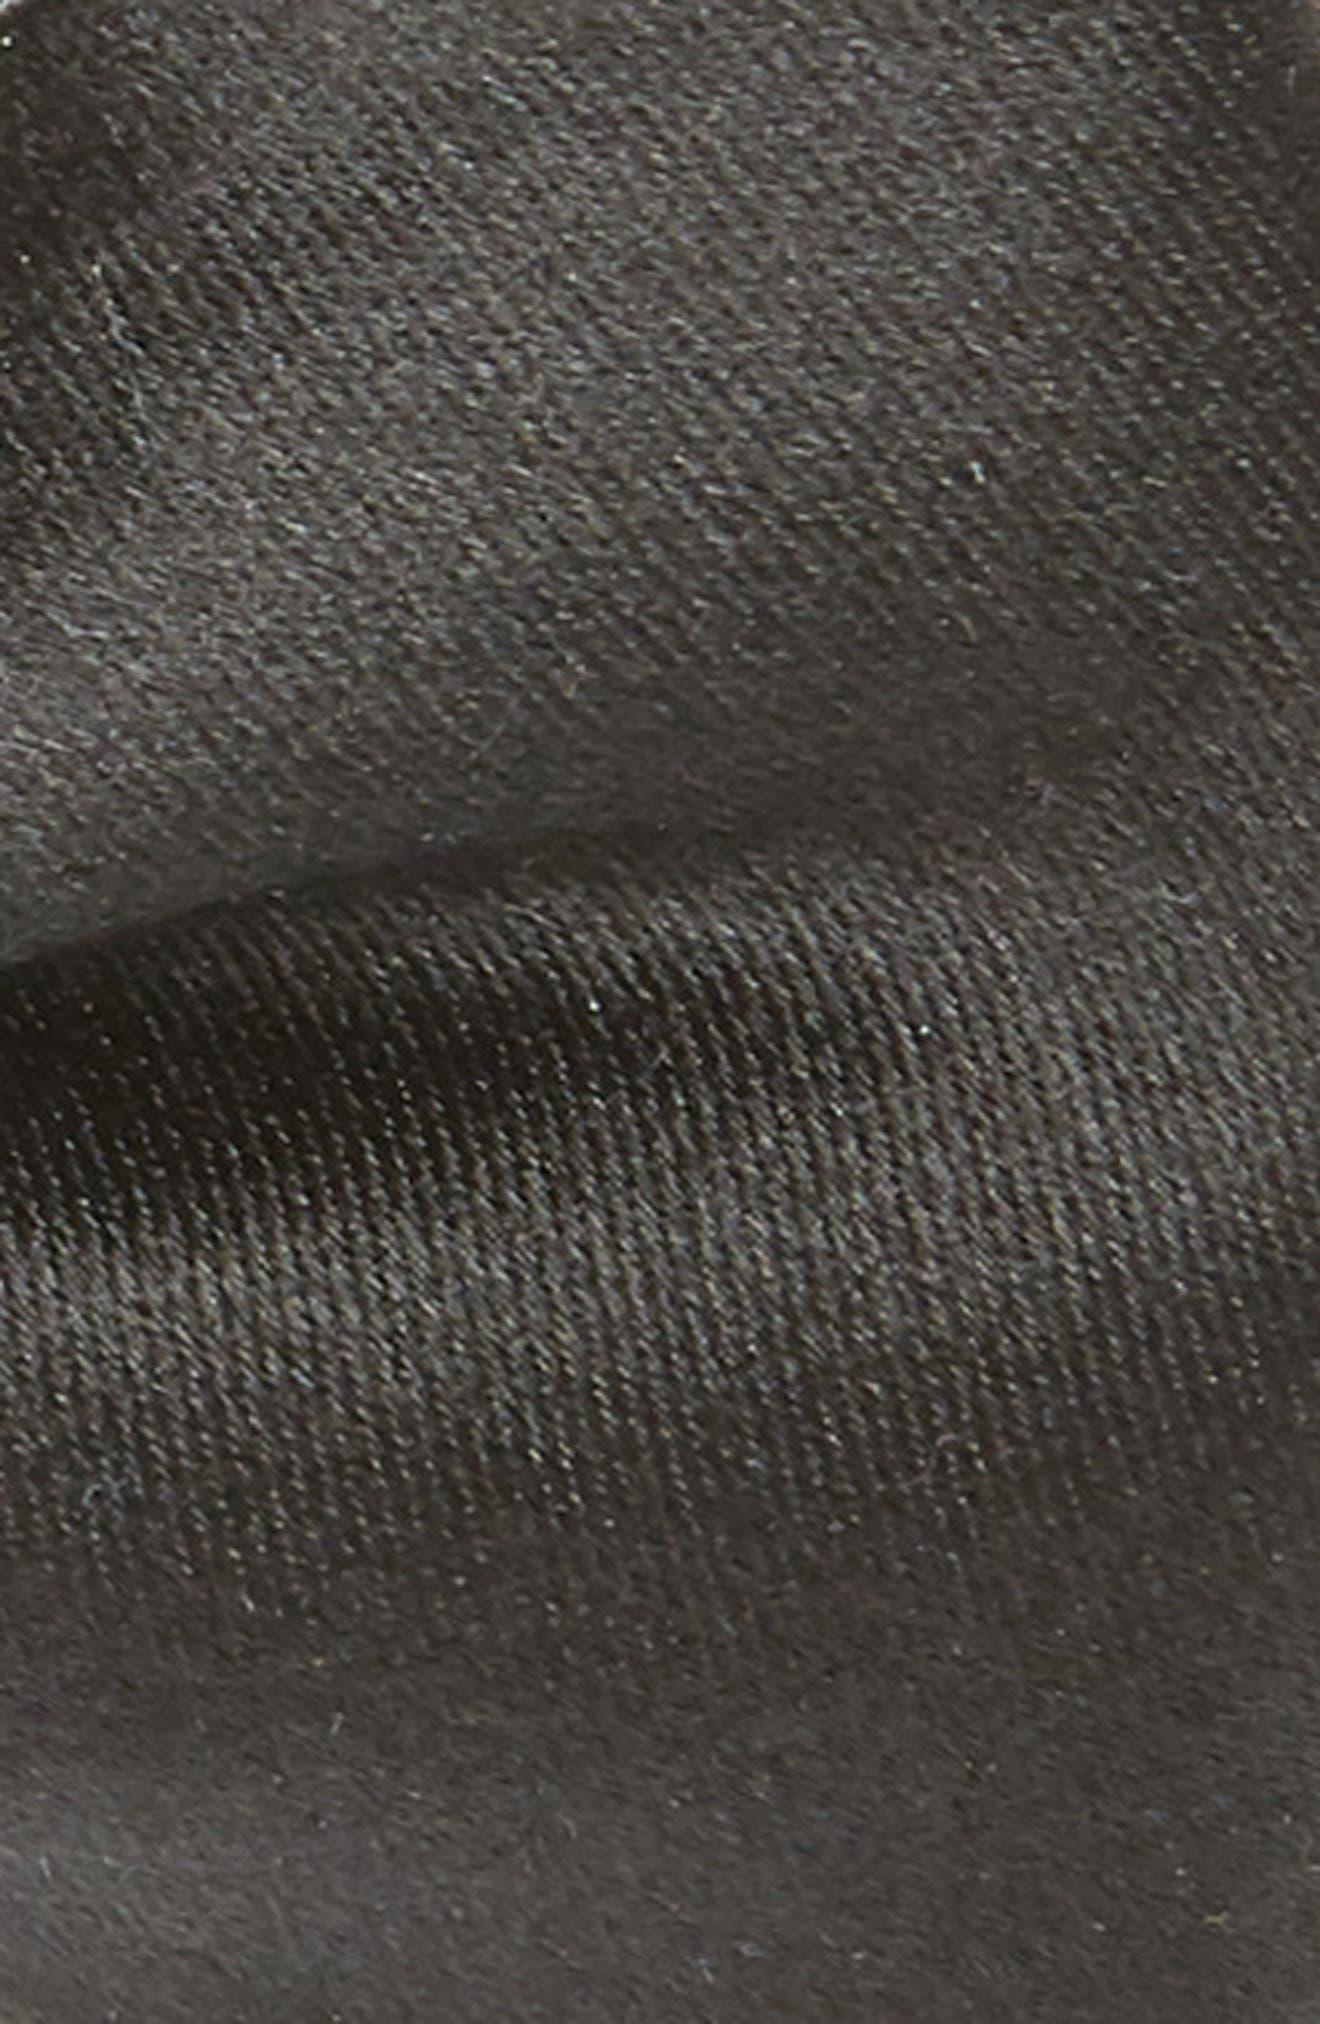 NORDSTROM MEN'S SHOP,                             Solid Silk Bow Tie,                             Alternate thumbnail 2, color,                             BLACK